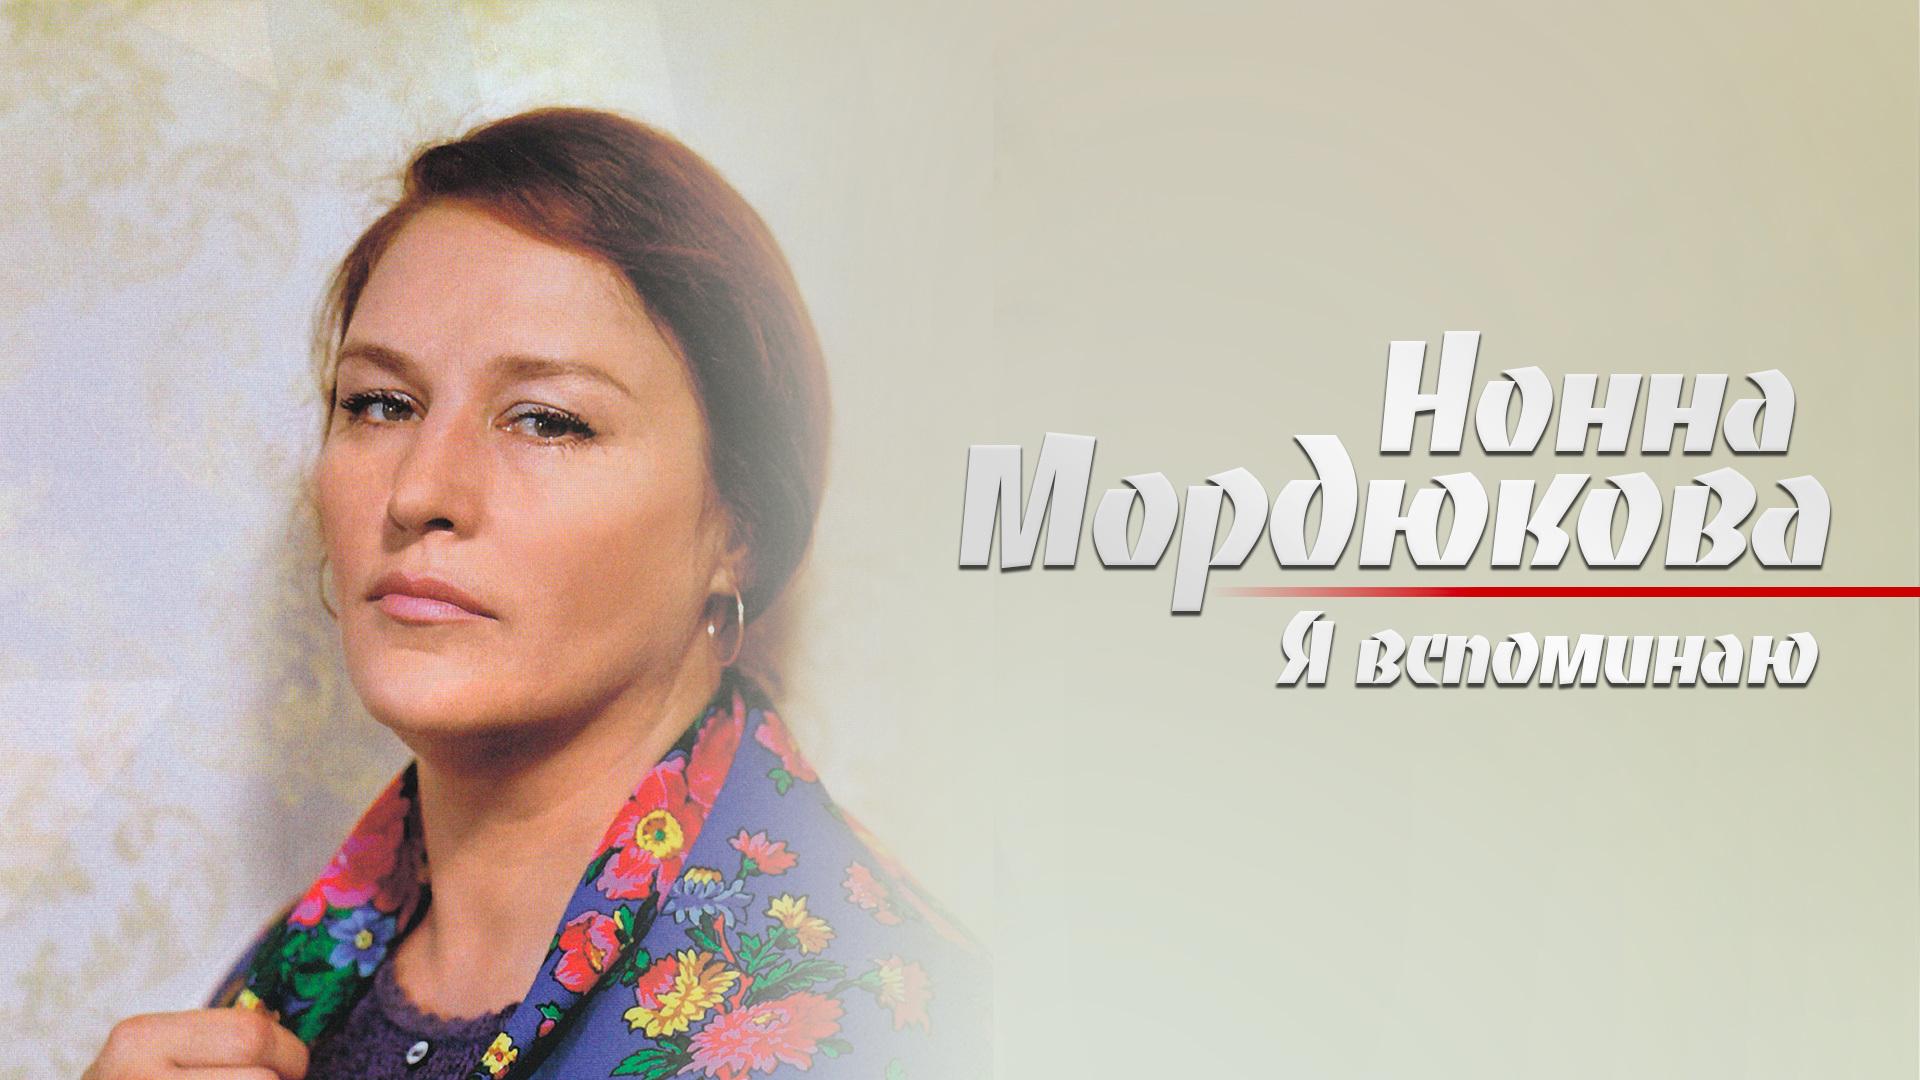 Нонна Мордюкова. Я вспоминаю...